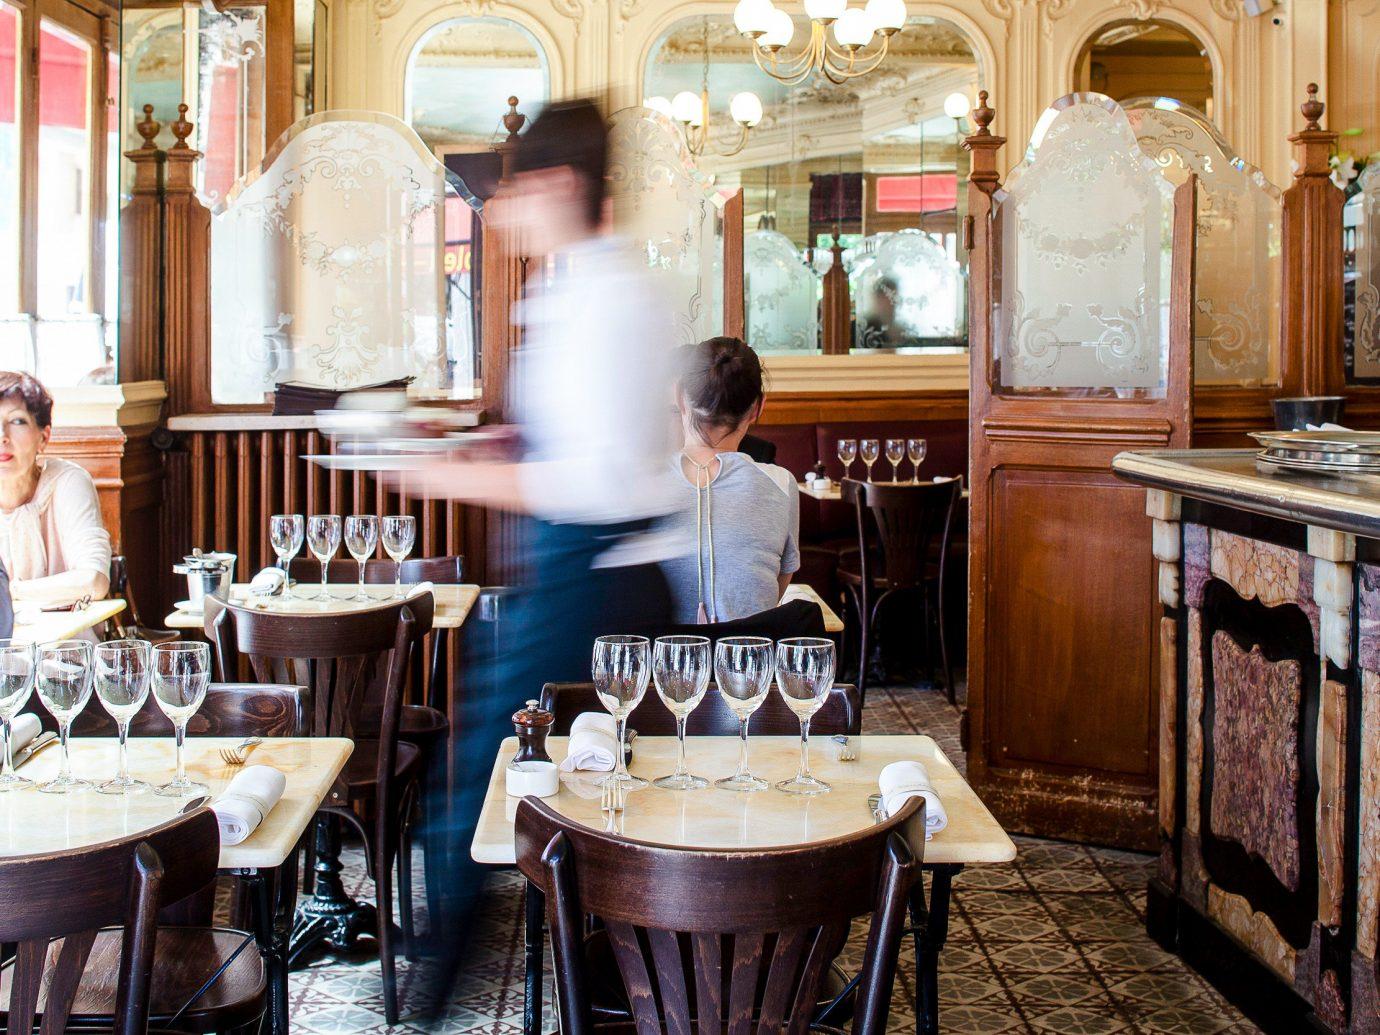 Food + Drink France Paris indoor furniture table restaurant interior design cooking meal